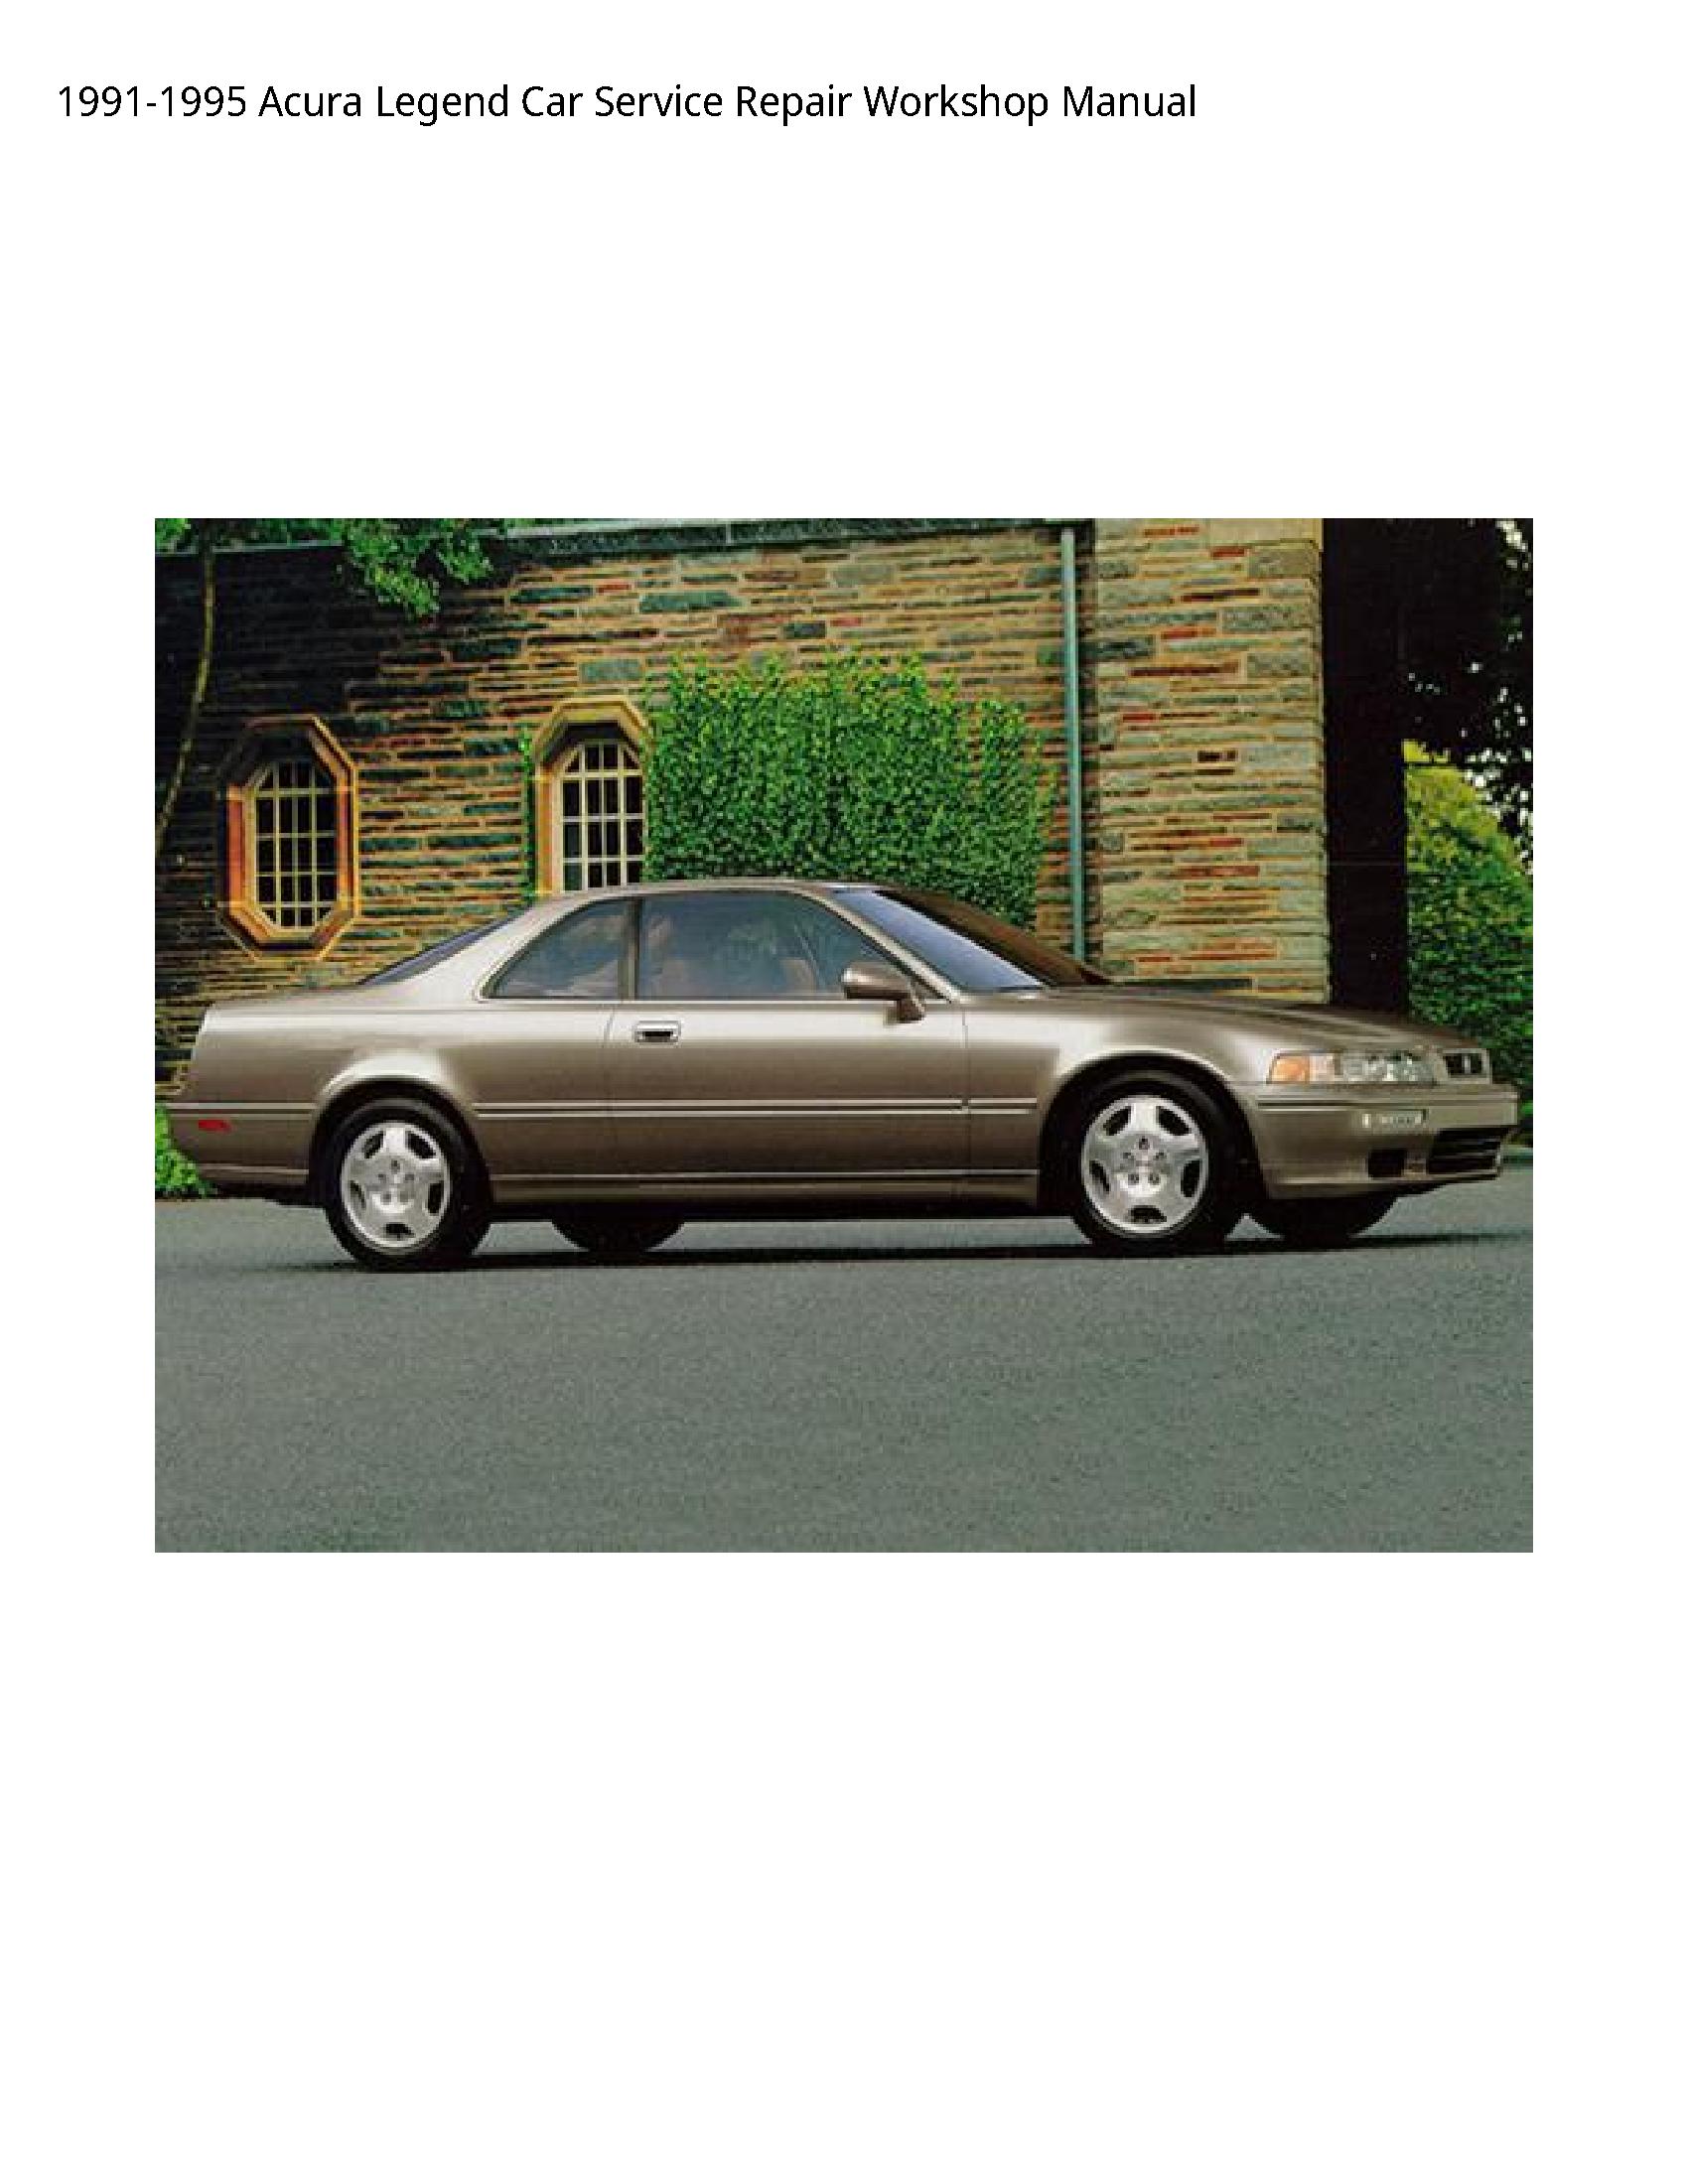 Acura Legend Car manual